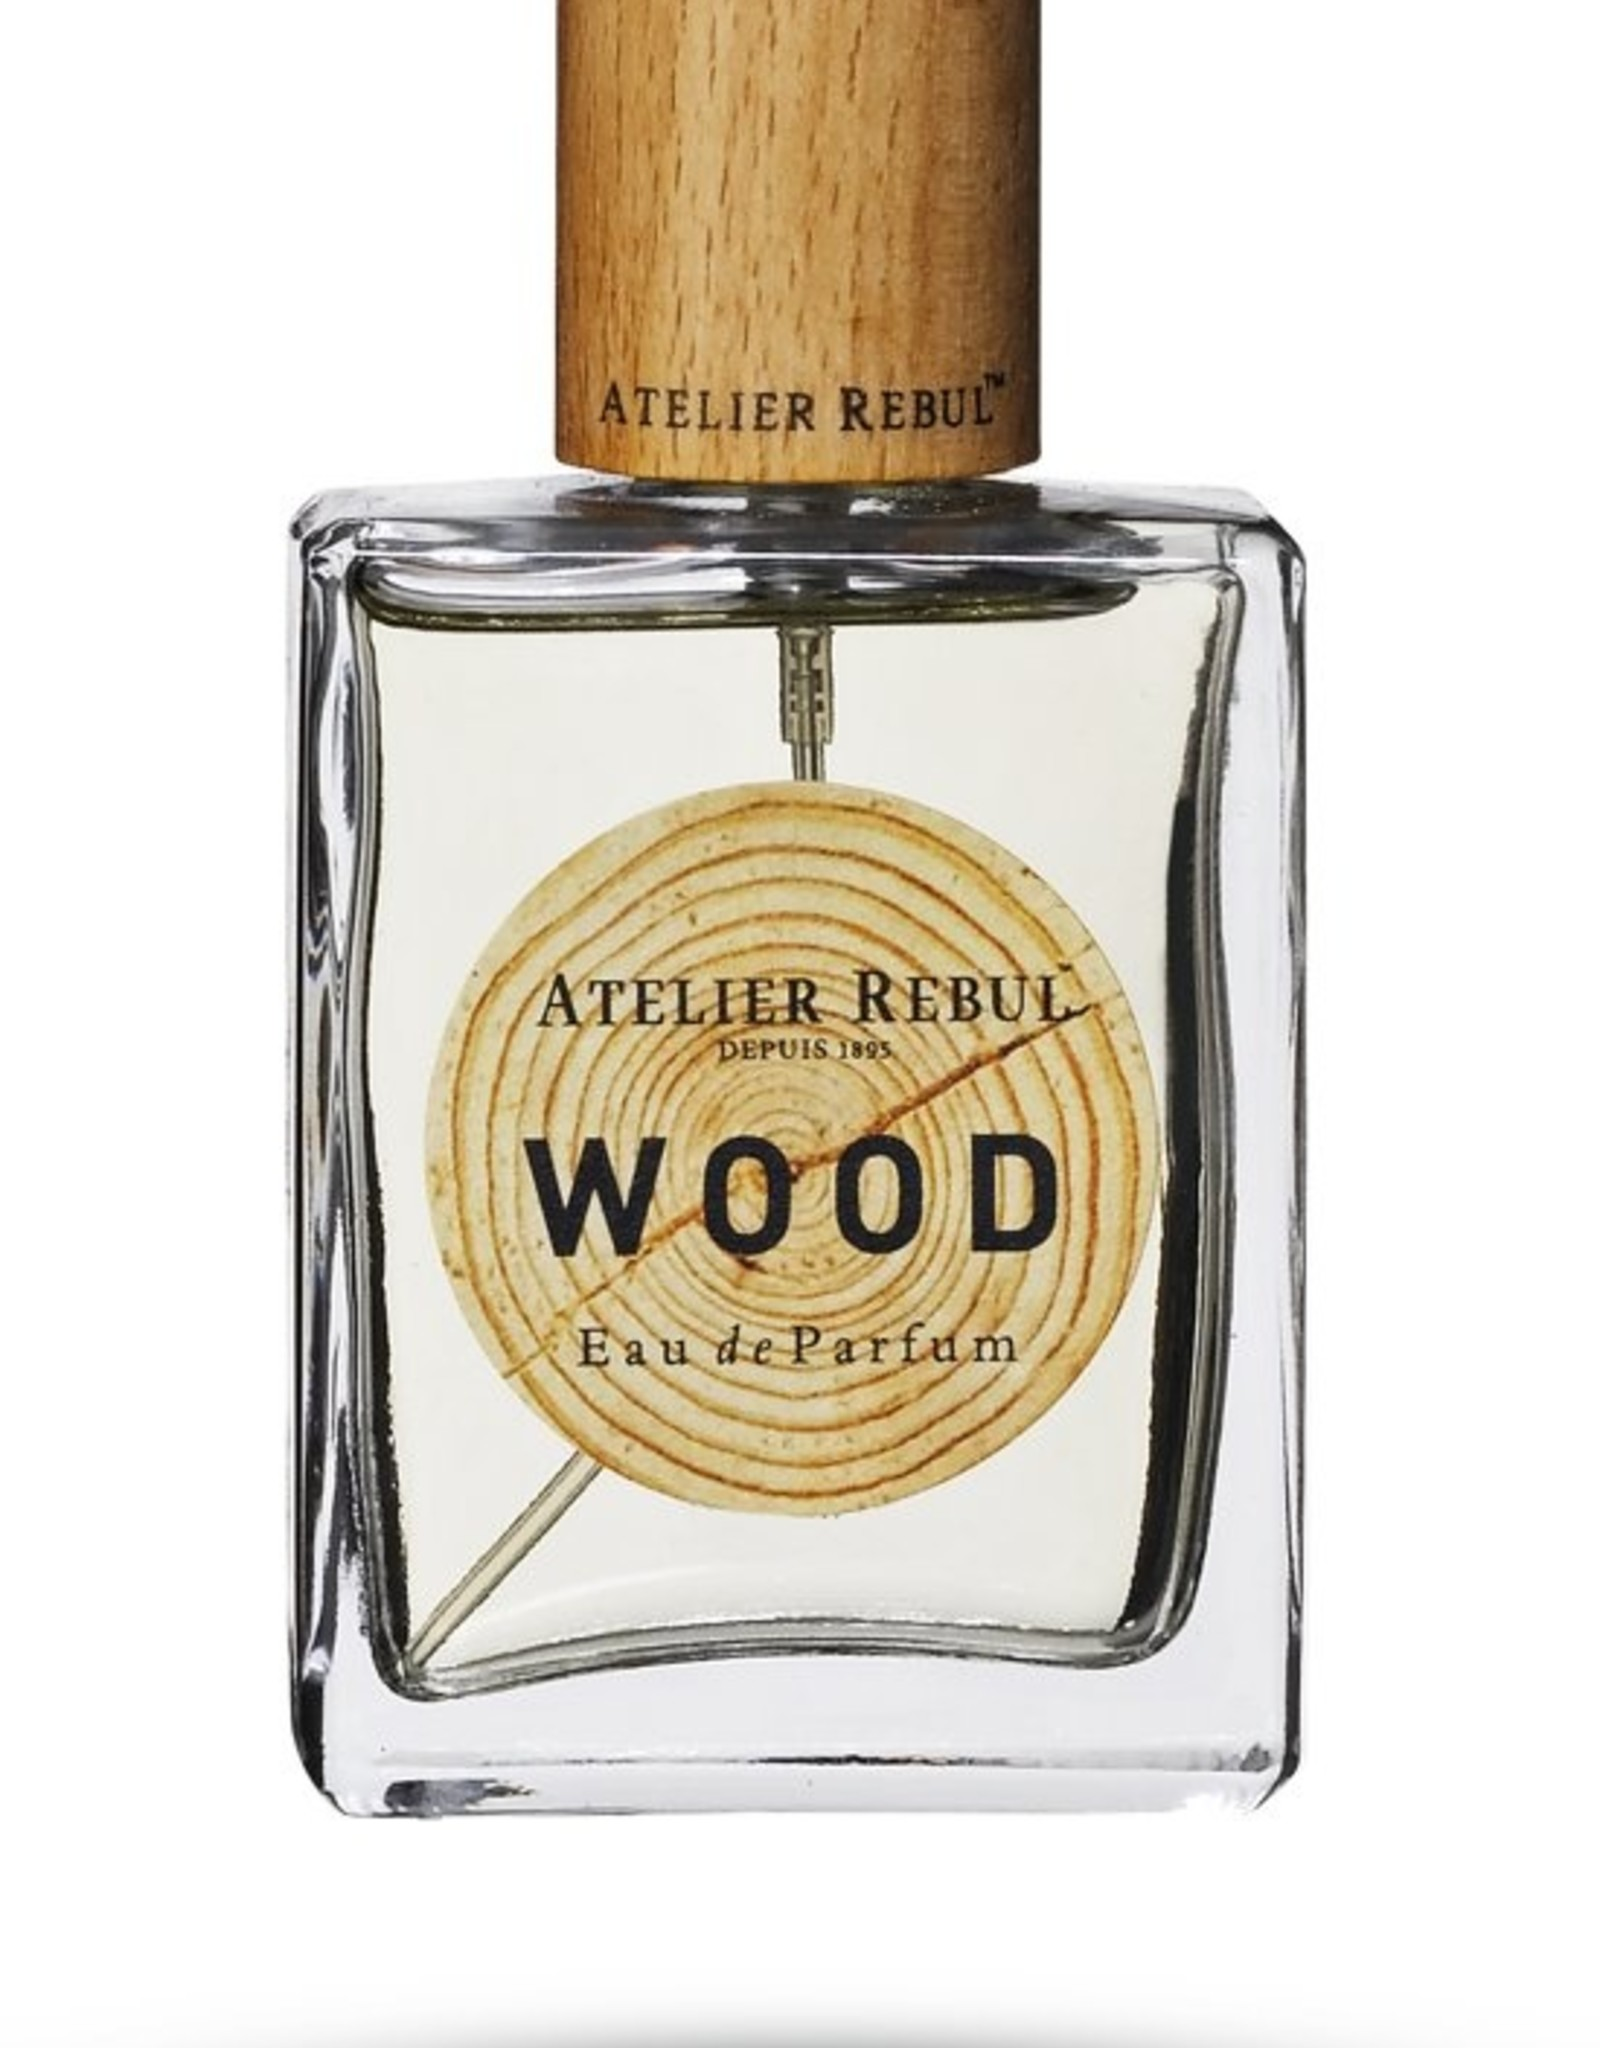 AtRe Atelier Rebul Perfume Wood 50ml